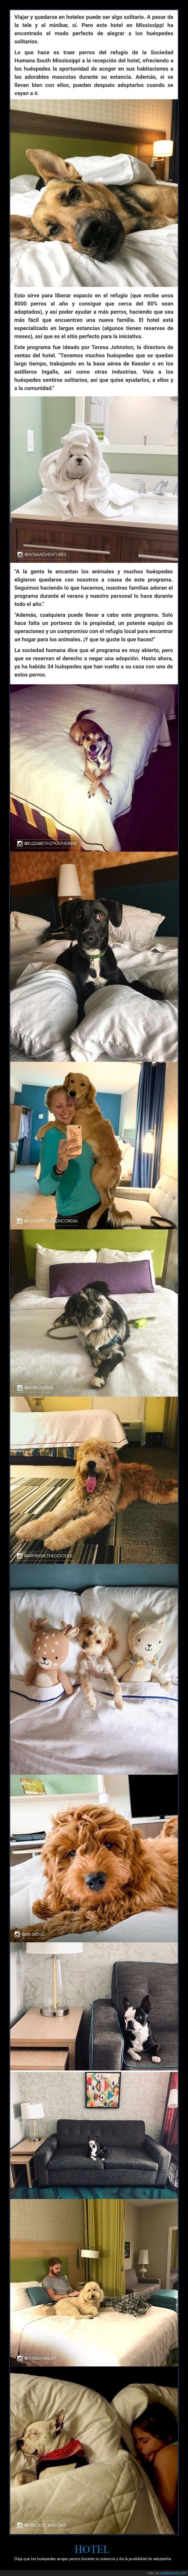 adoptar,hotel,perros